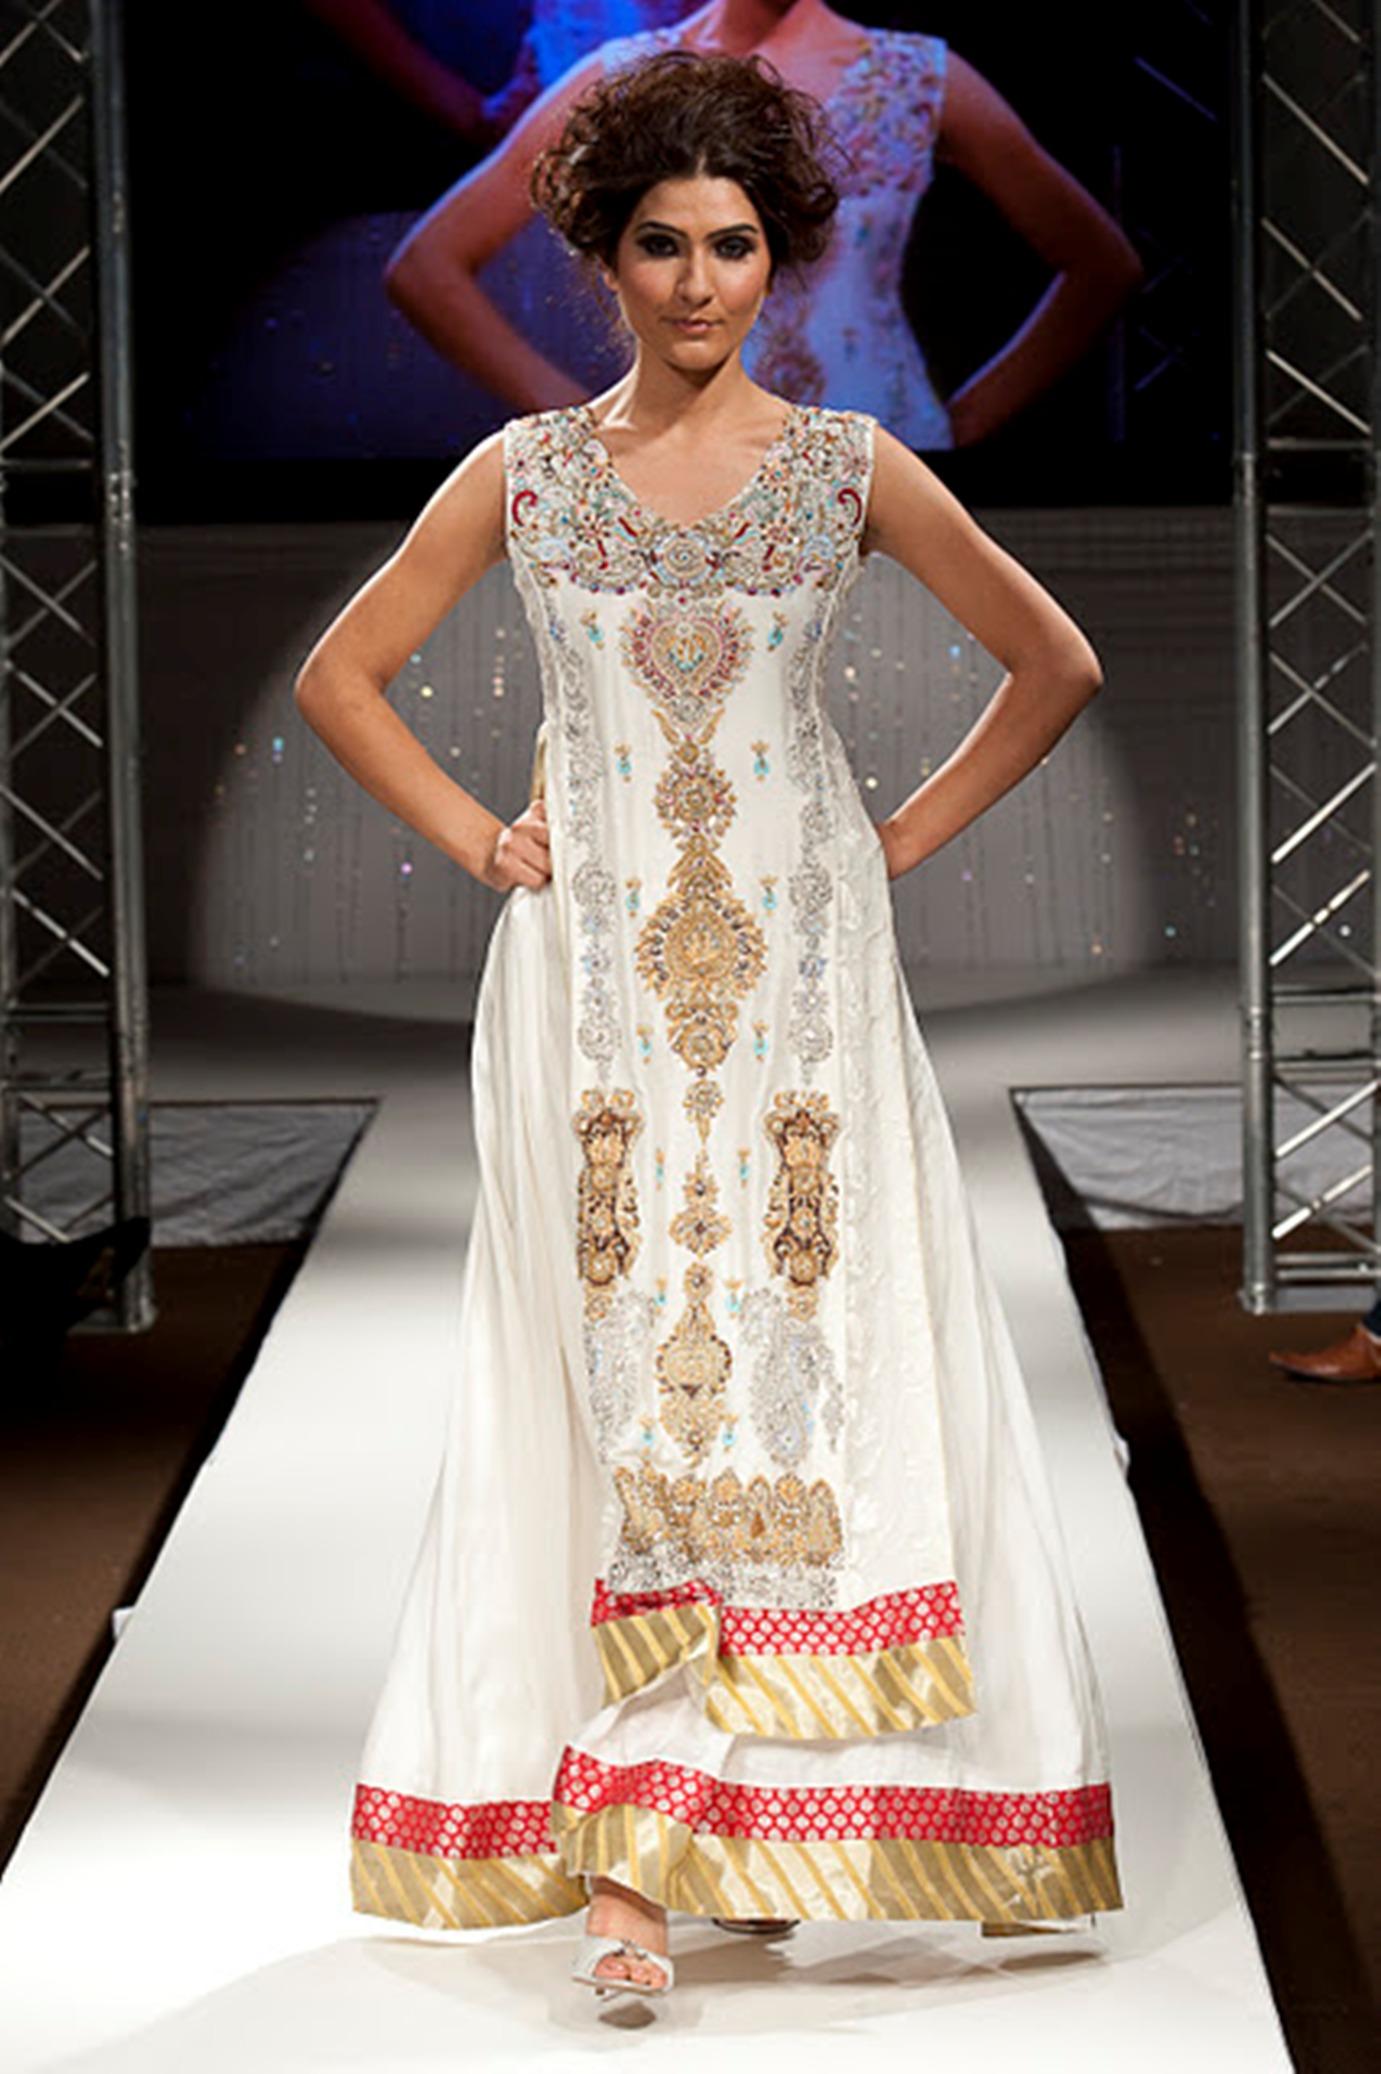 بالصور فساتين اعراس هندي , اجمل فستان هندى 247 1